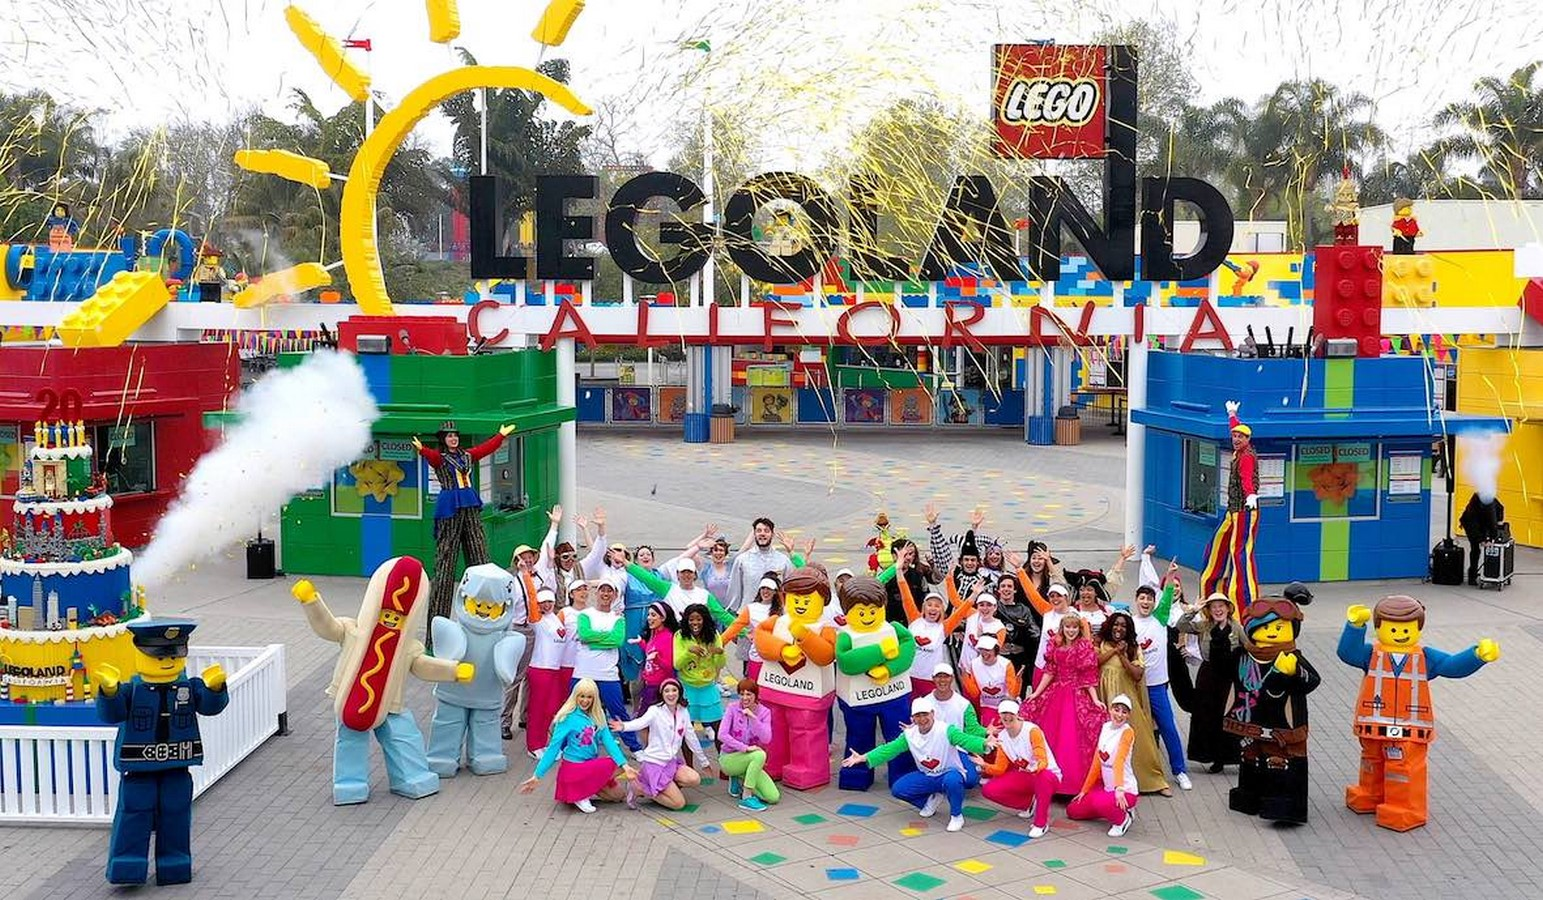 Designing amusement Park for Disabled - Sheet6